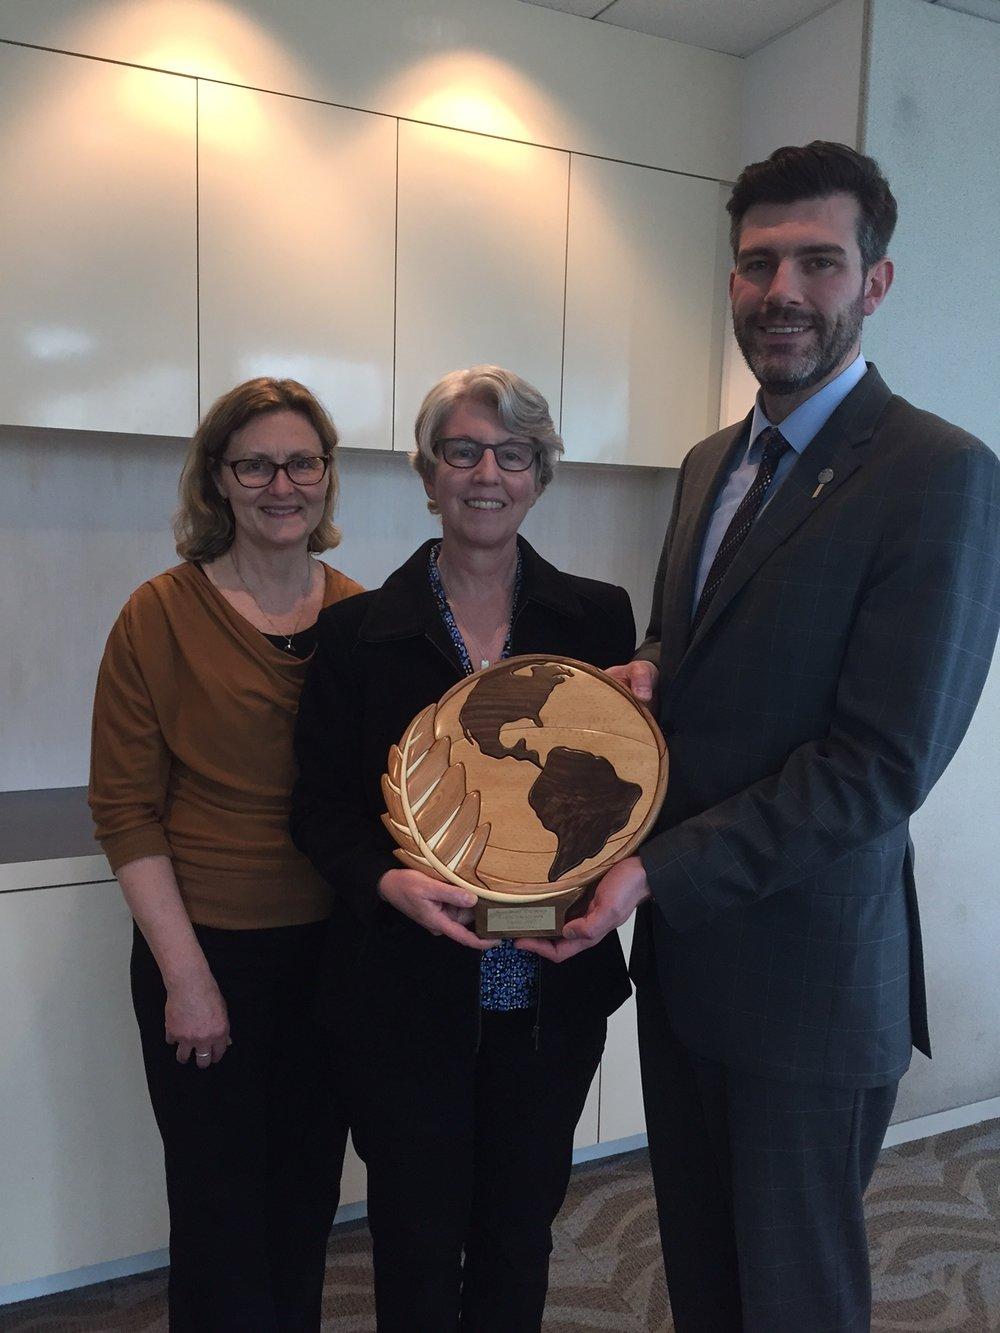 Mayor Don Iveson presents the 2017 Earth Ambassador Award to Wildbirds Unlimited.